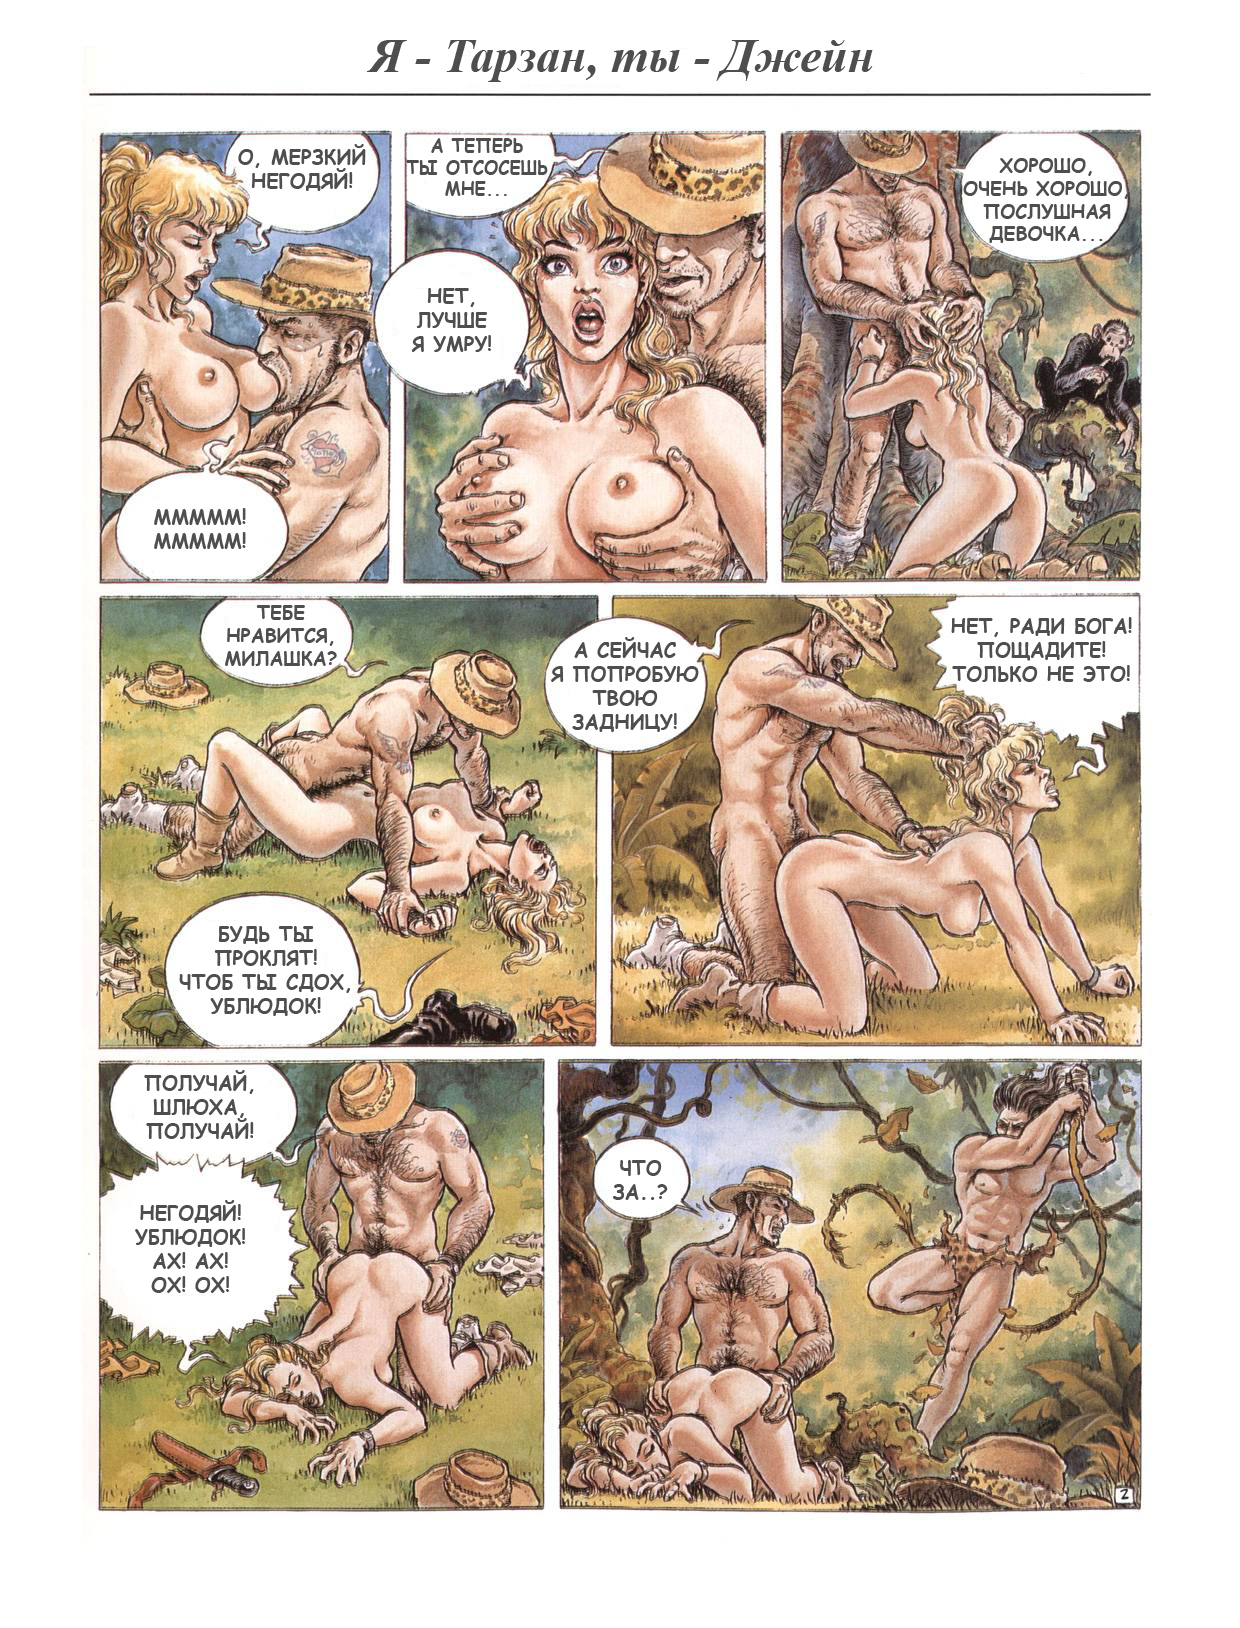 retro-porno-tarzan